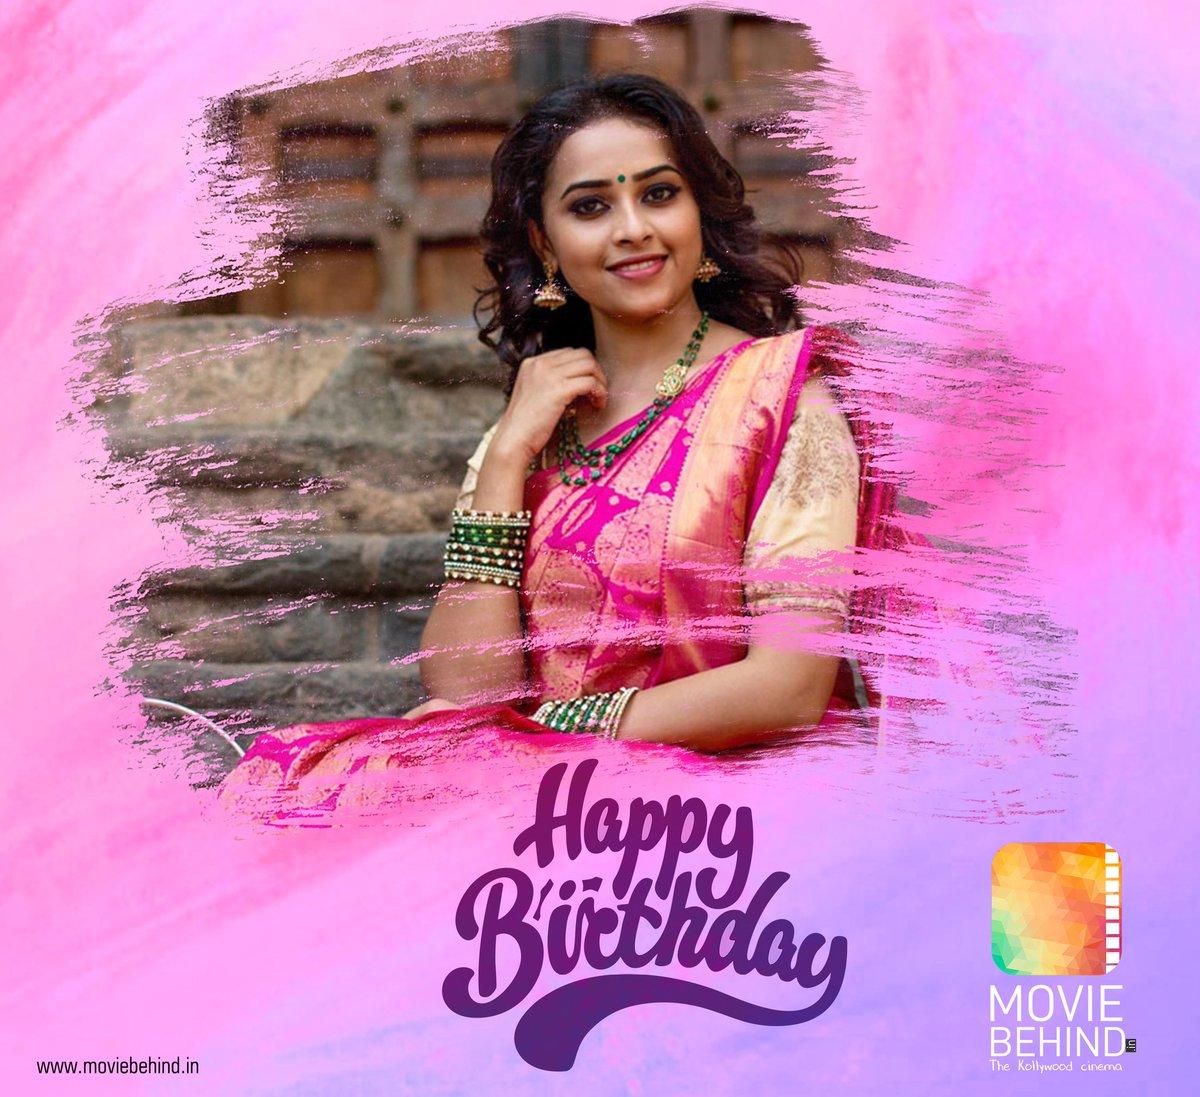 #SriDivya #birthday #TamilCinema #tamilactress #tamilmovie #cutegirl #actress @SDsridivya @ItzSriDivya @Sridivyafp @queensdsri @SriDivyaFCpic.twitter.com/AD5W47Kvgc